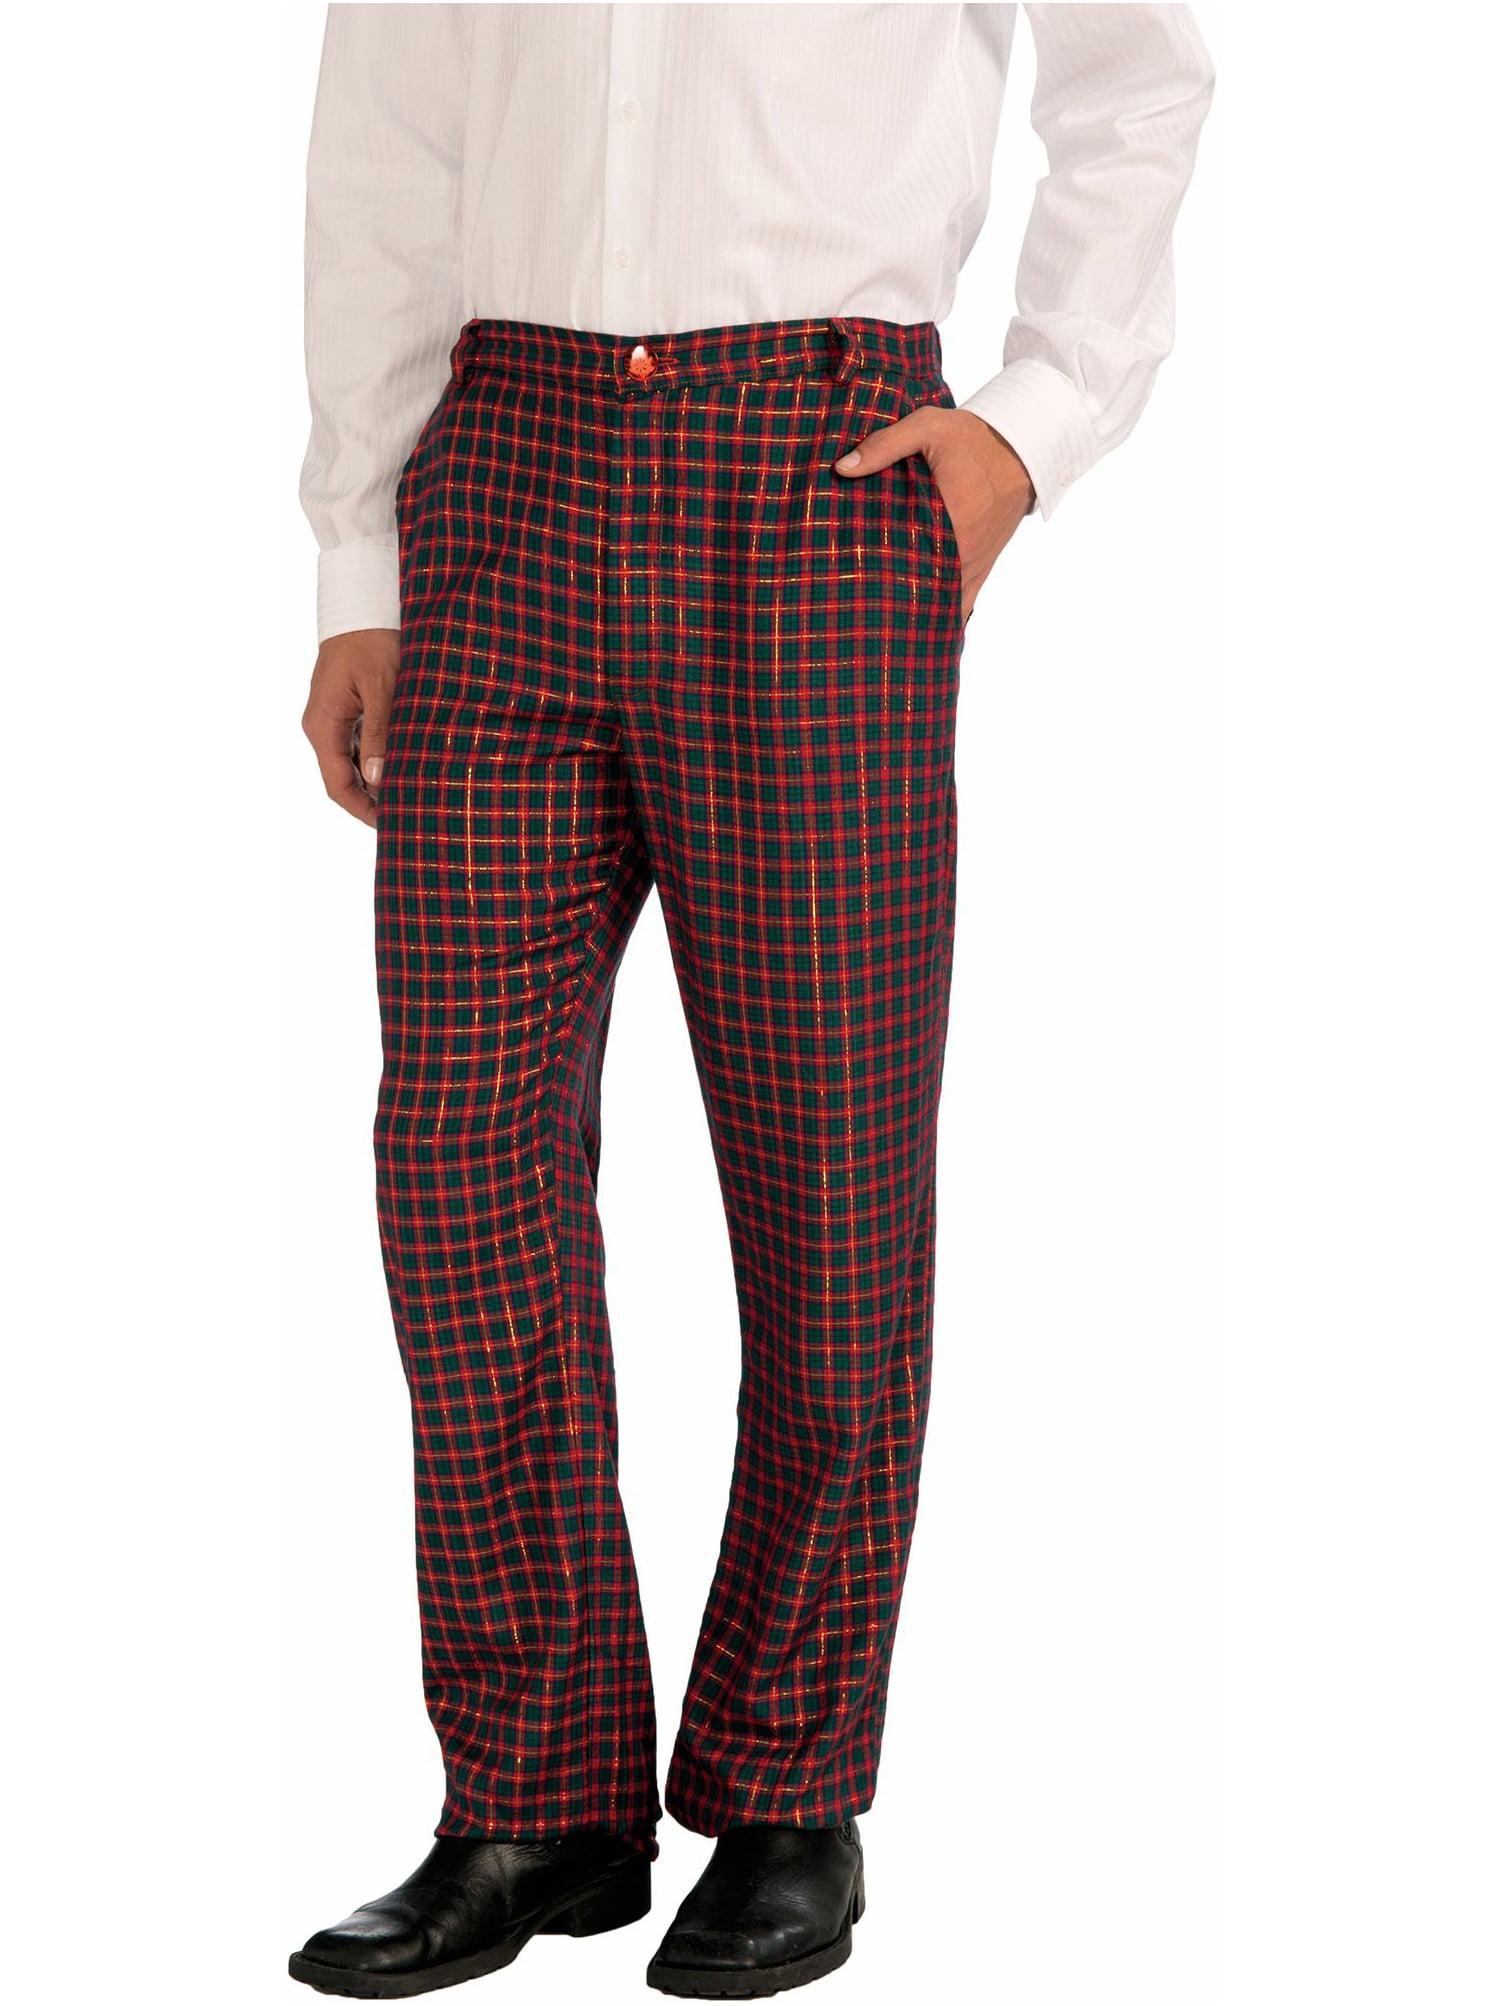 Christmas Plaid Pants - Walmart.com